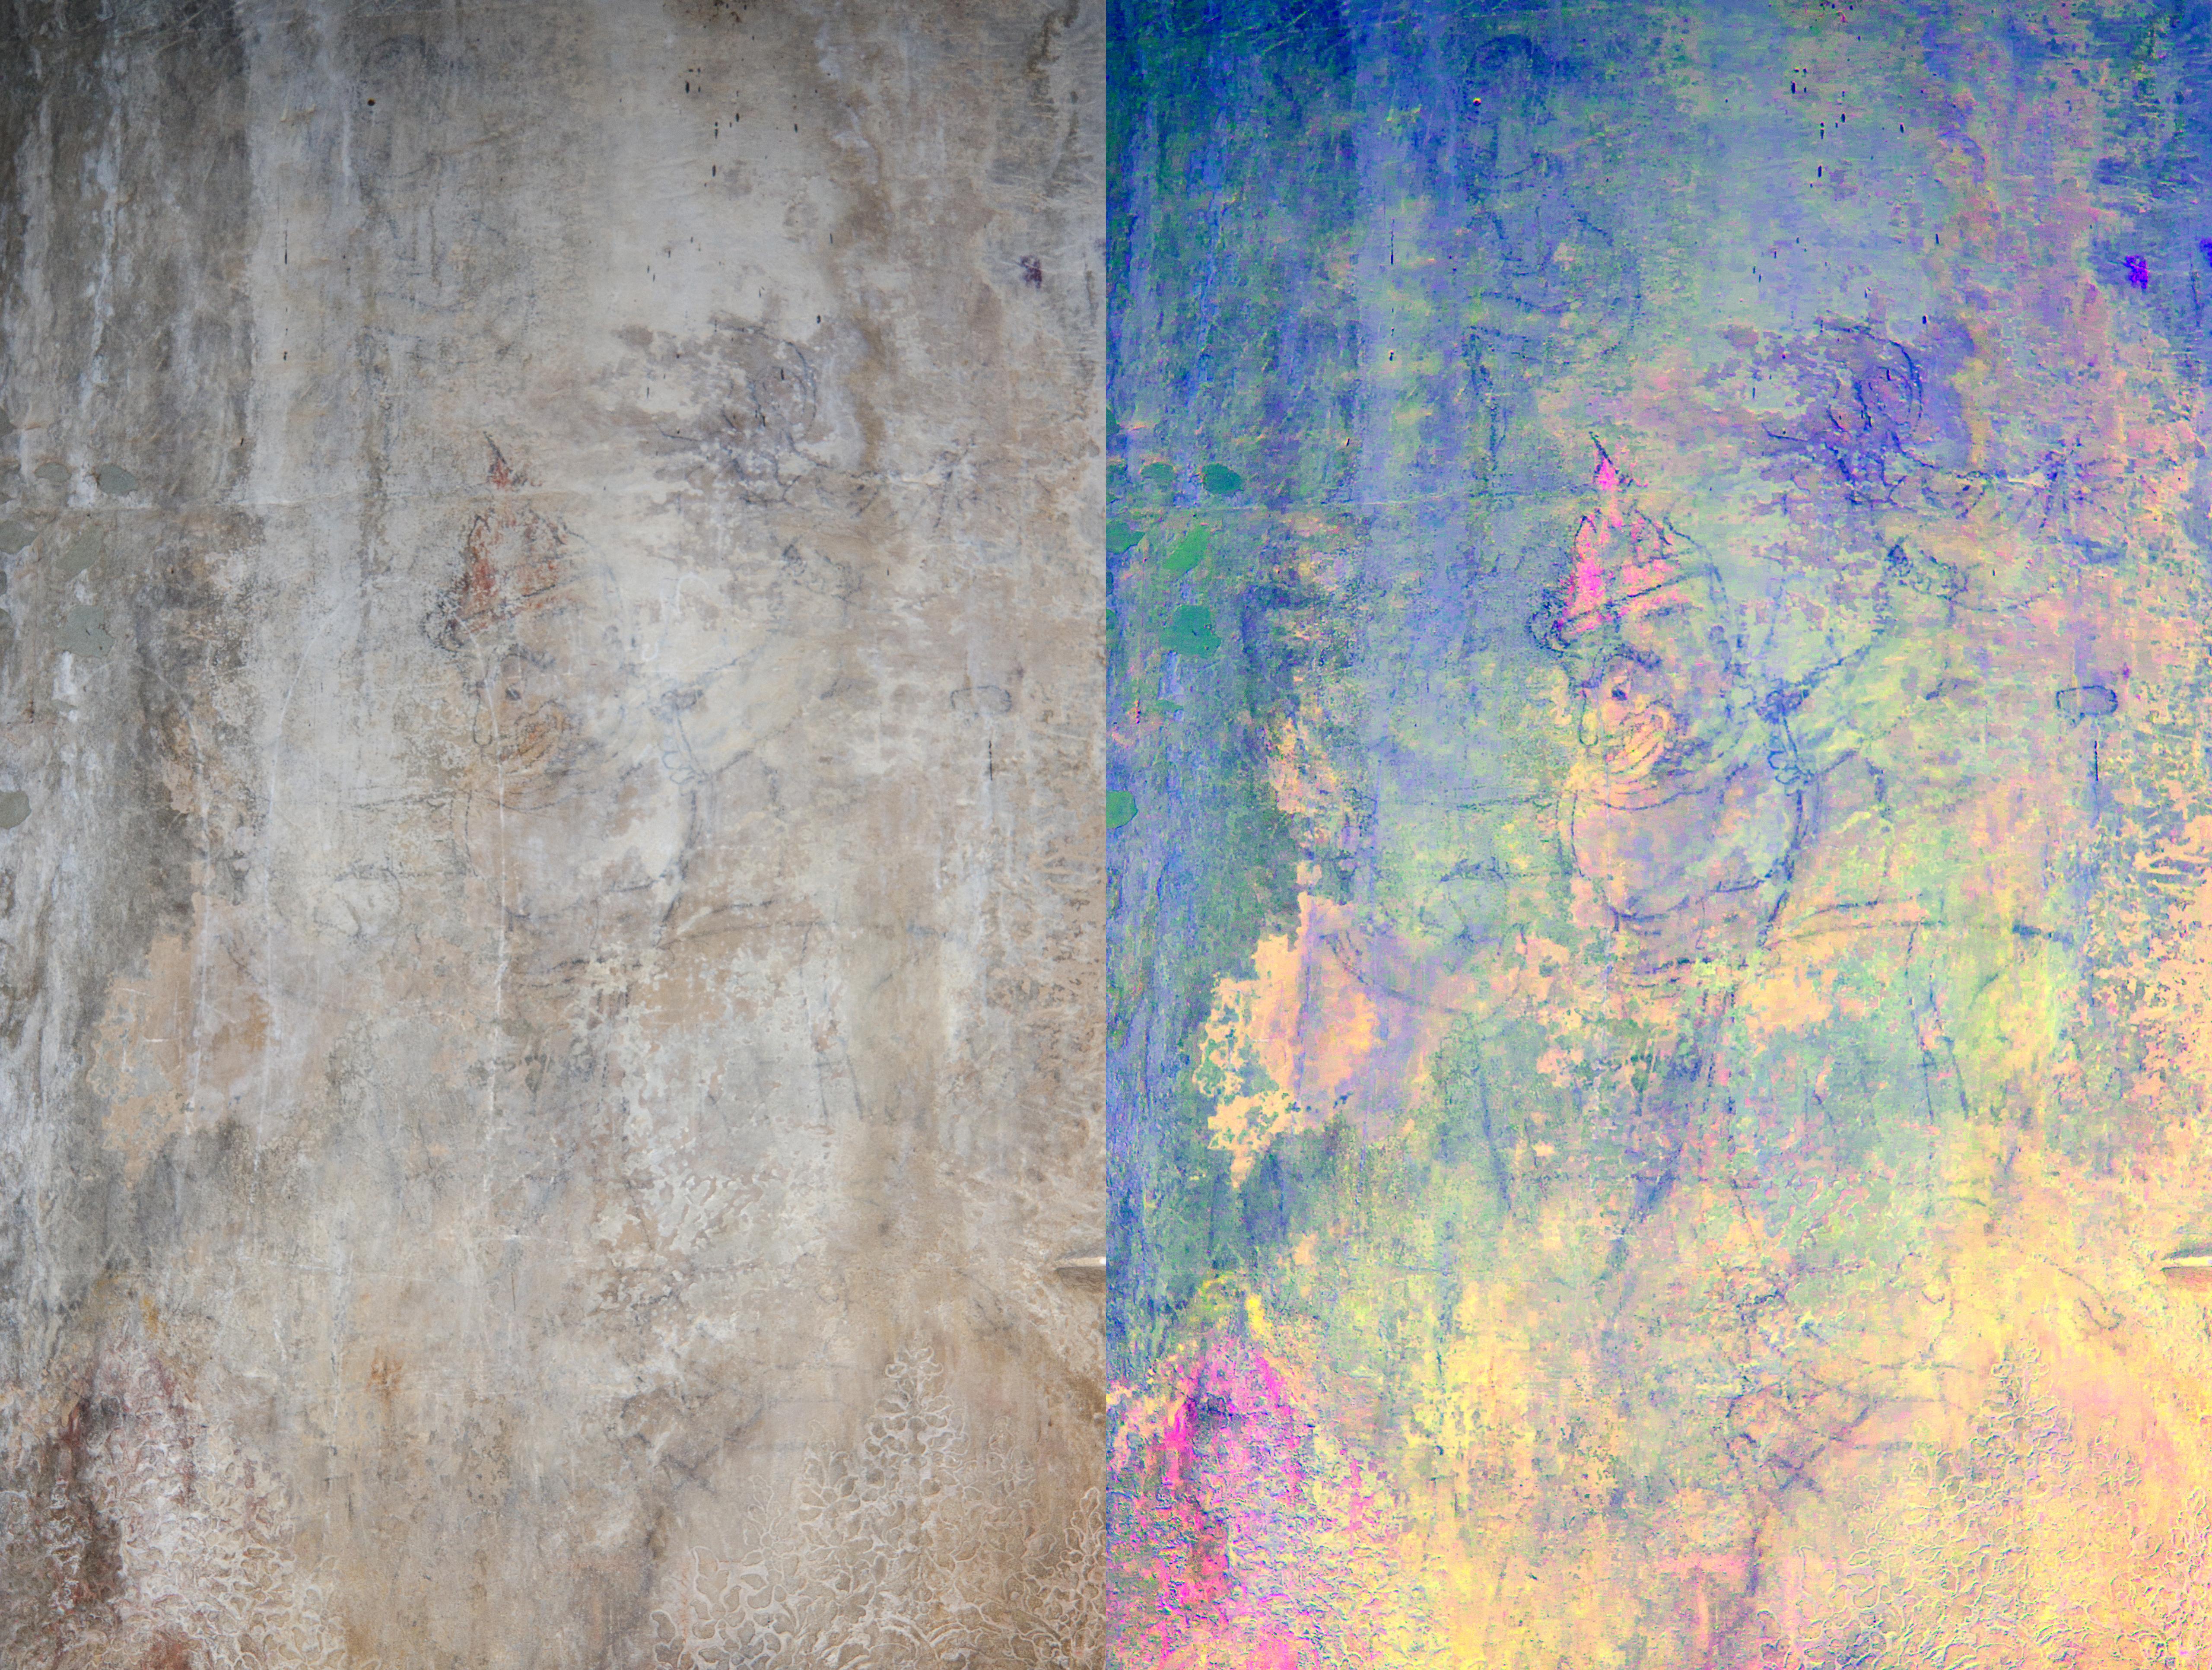 Left: plain view; right: after decorrelation stretch analysis digital enhancement